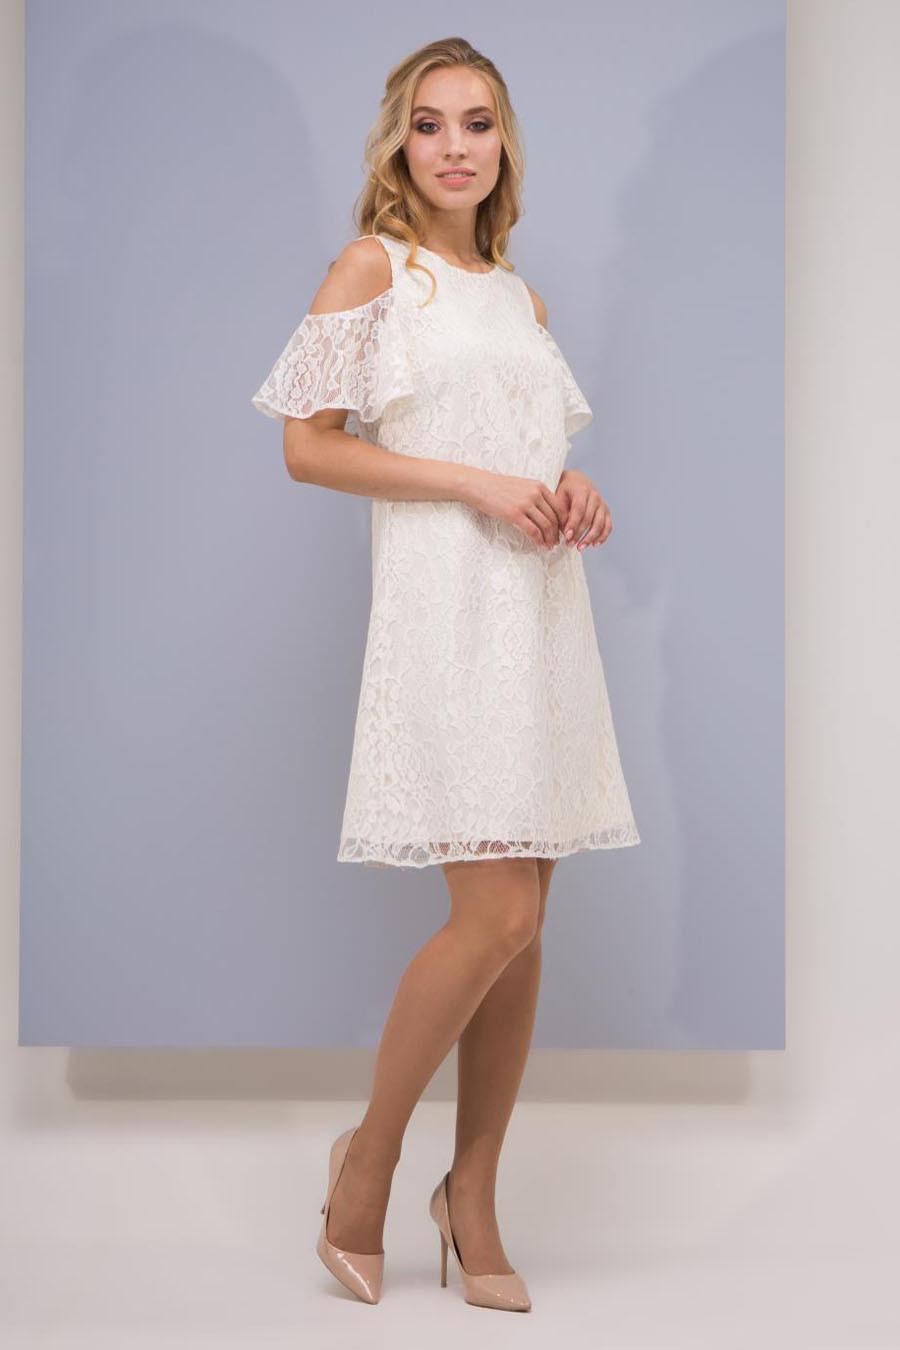 Платье ГЕЛЛА из салона Edler Weiss